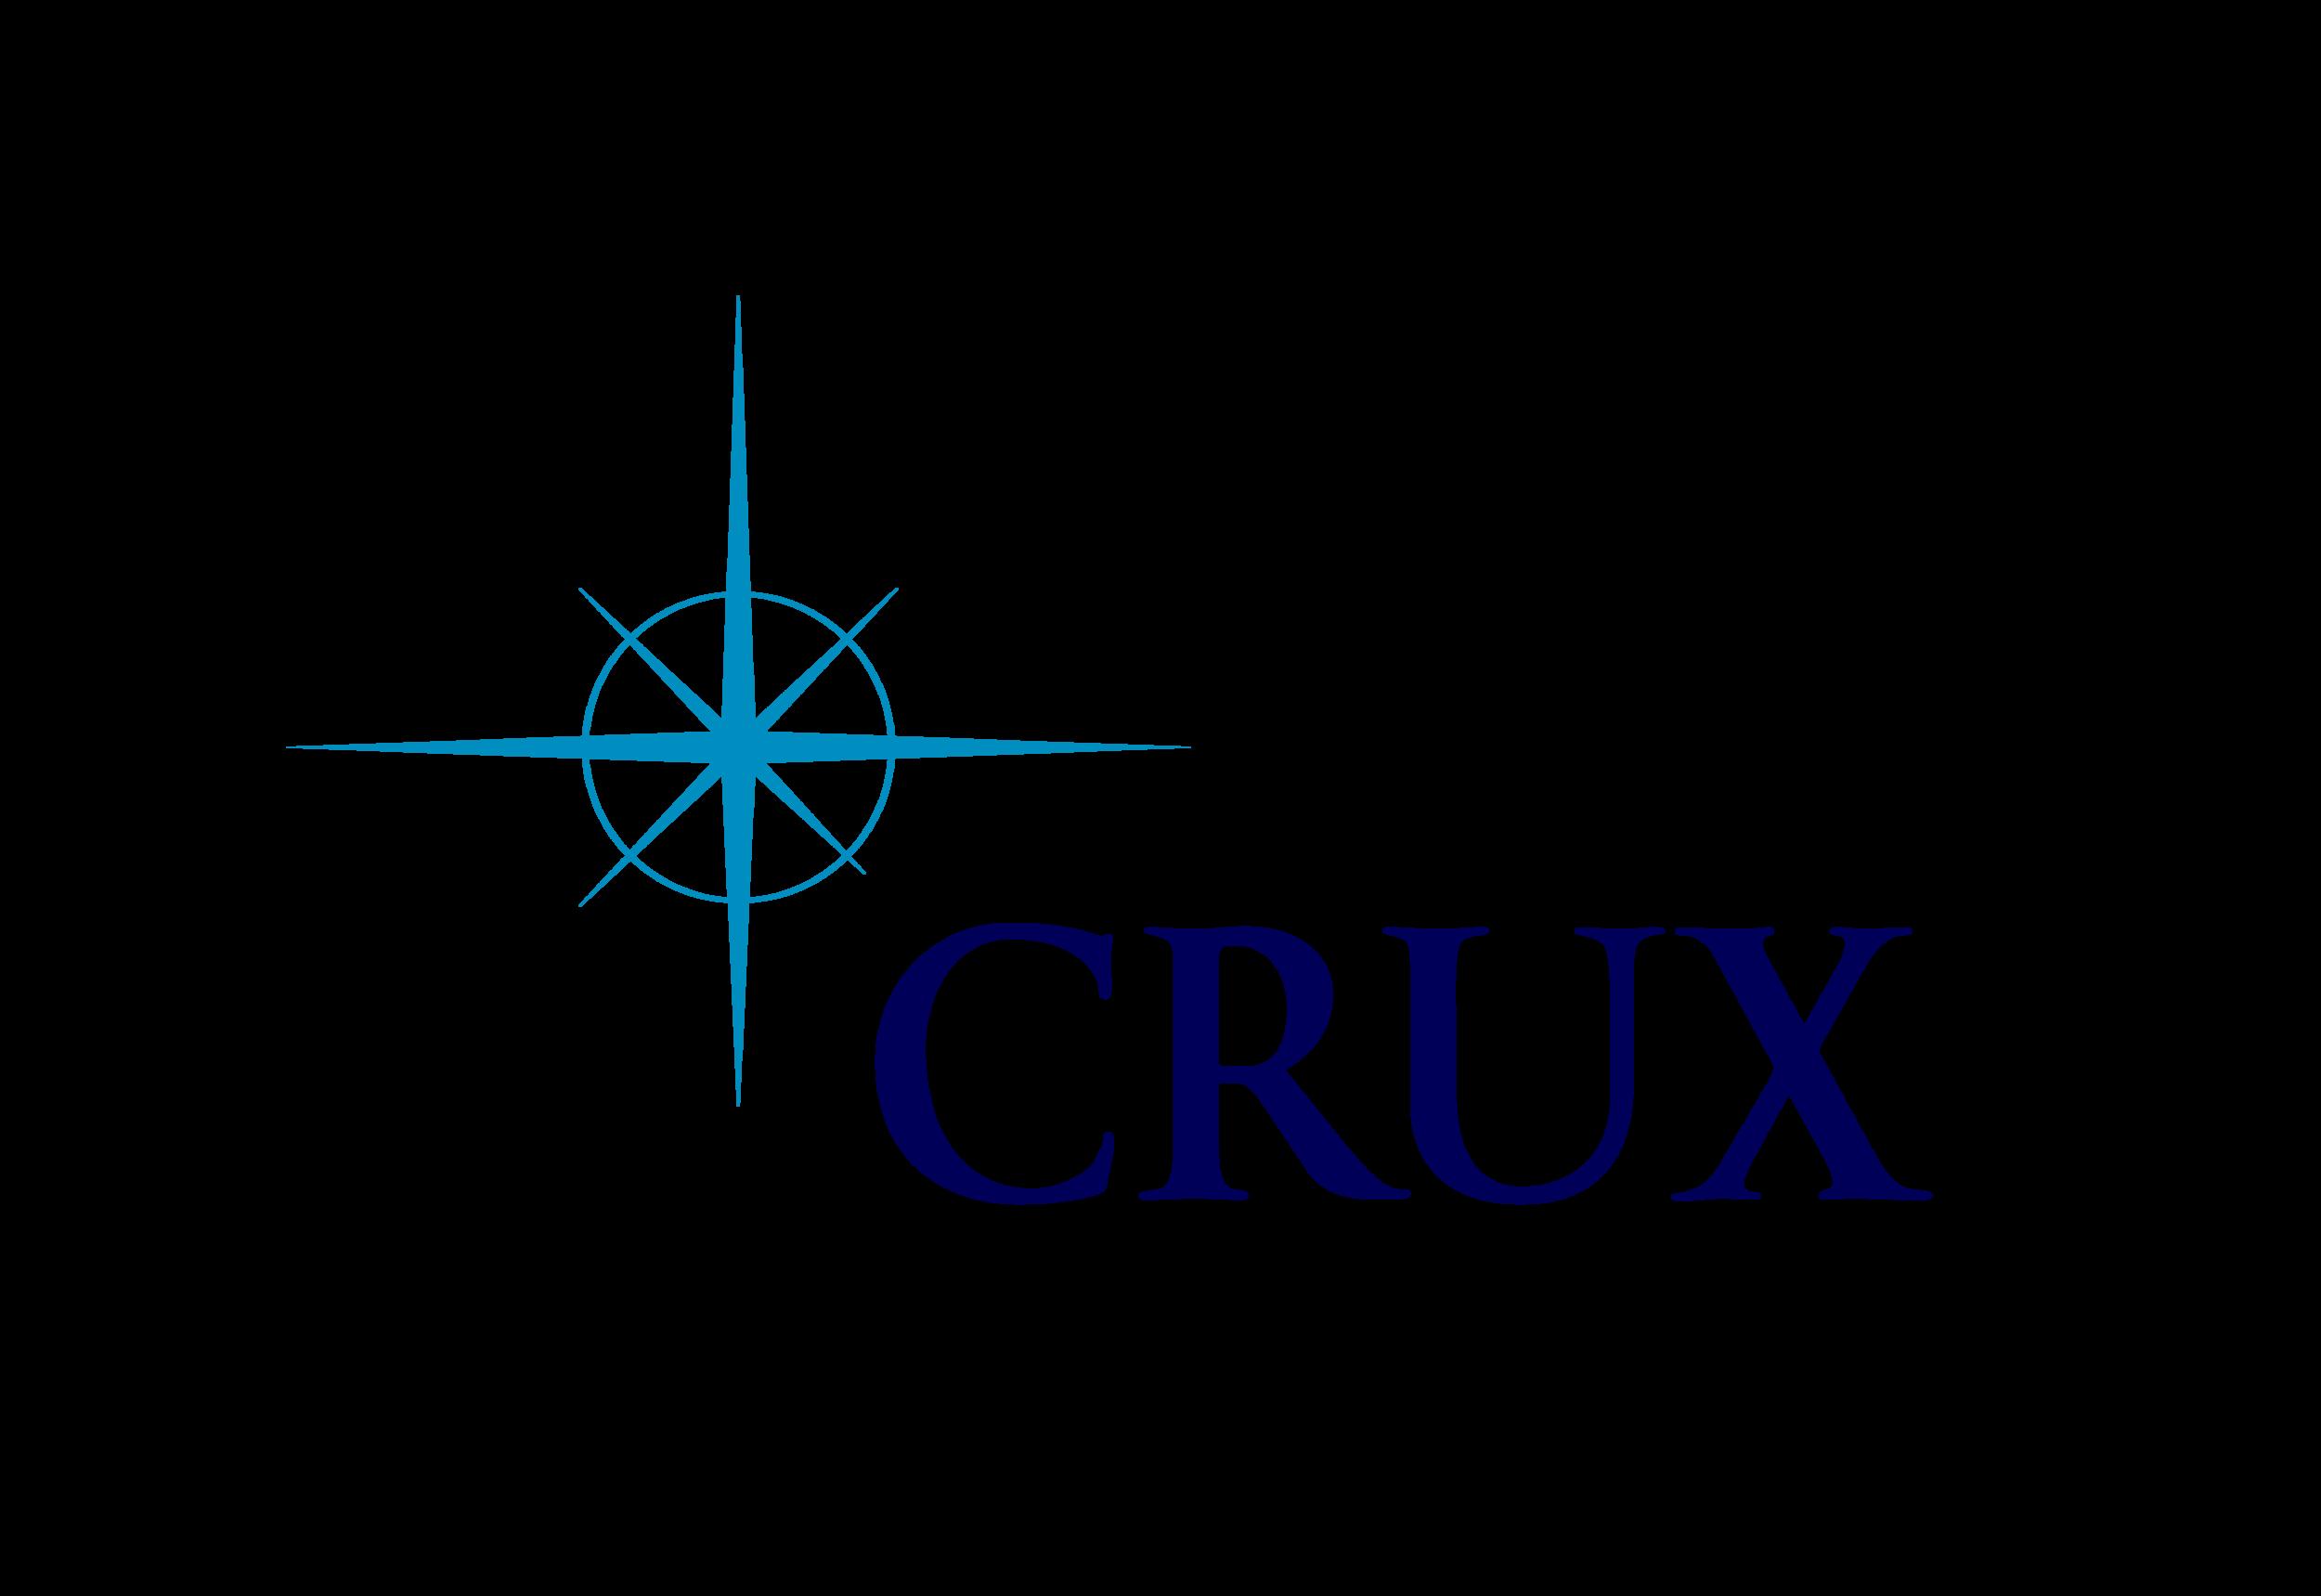 CruxLogo_10.2017_WithBuffer_RGB.png